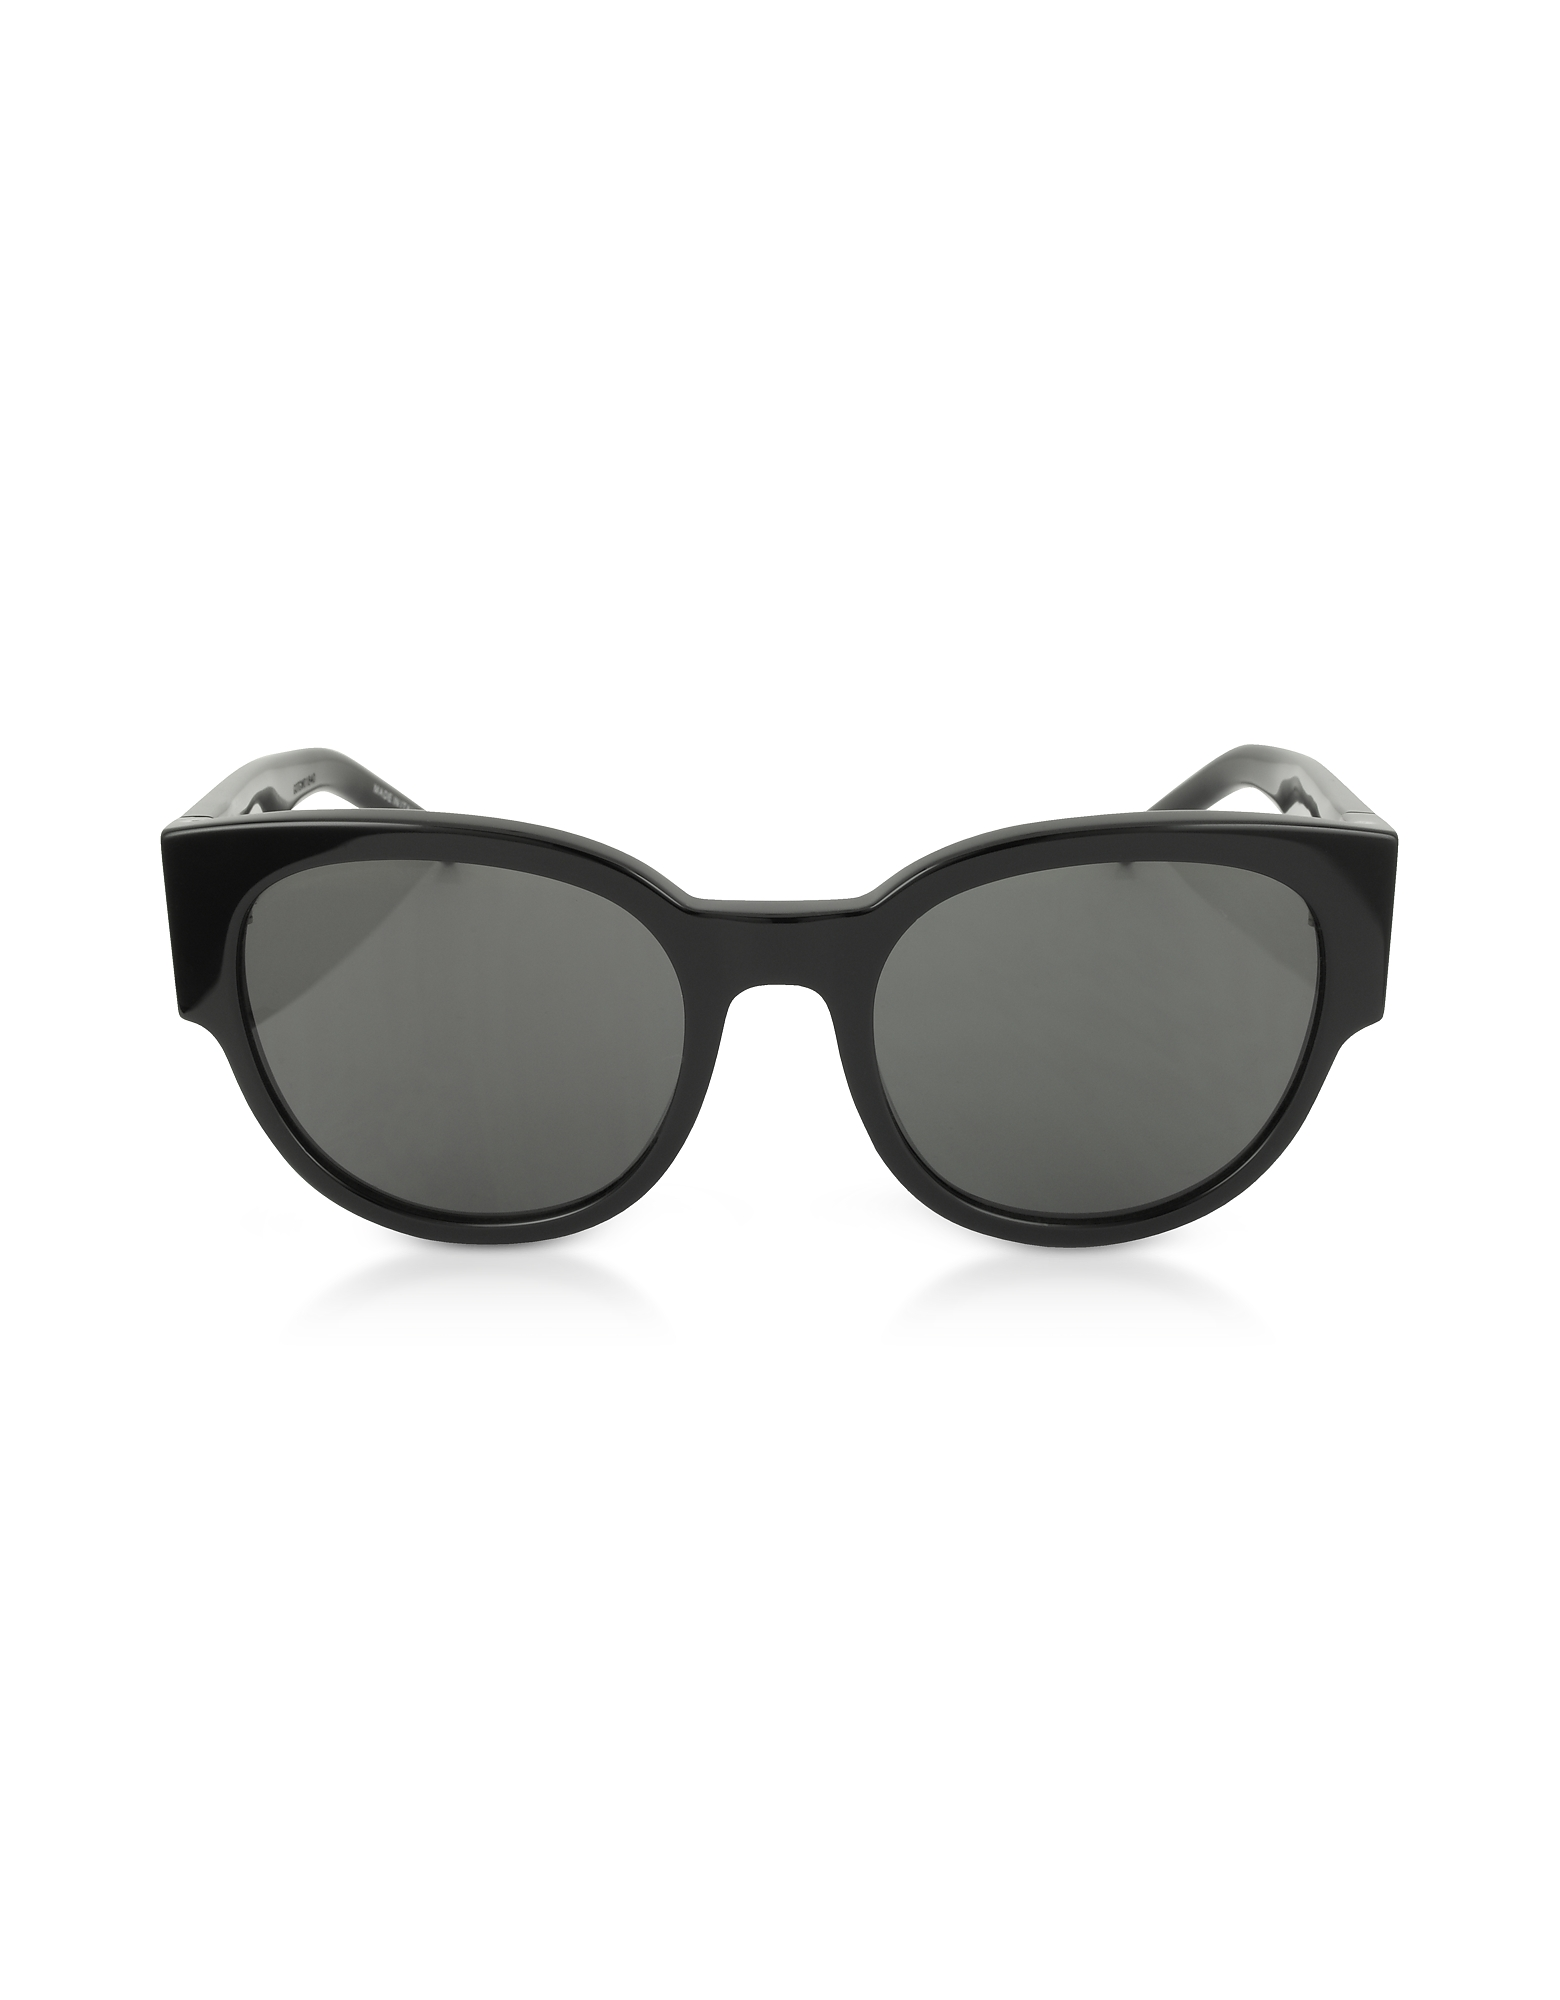 Saint Laurent Designer Sunglasses, SL M19 Acetate Oval Frame Women's Sunglasses